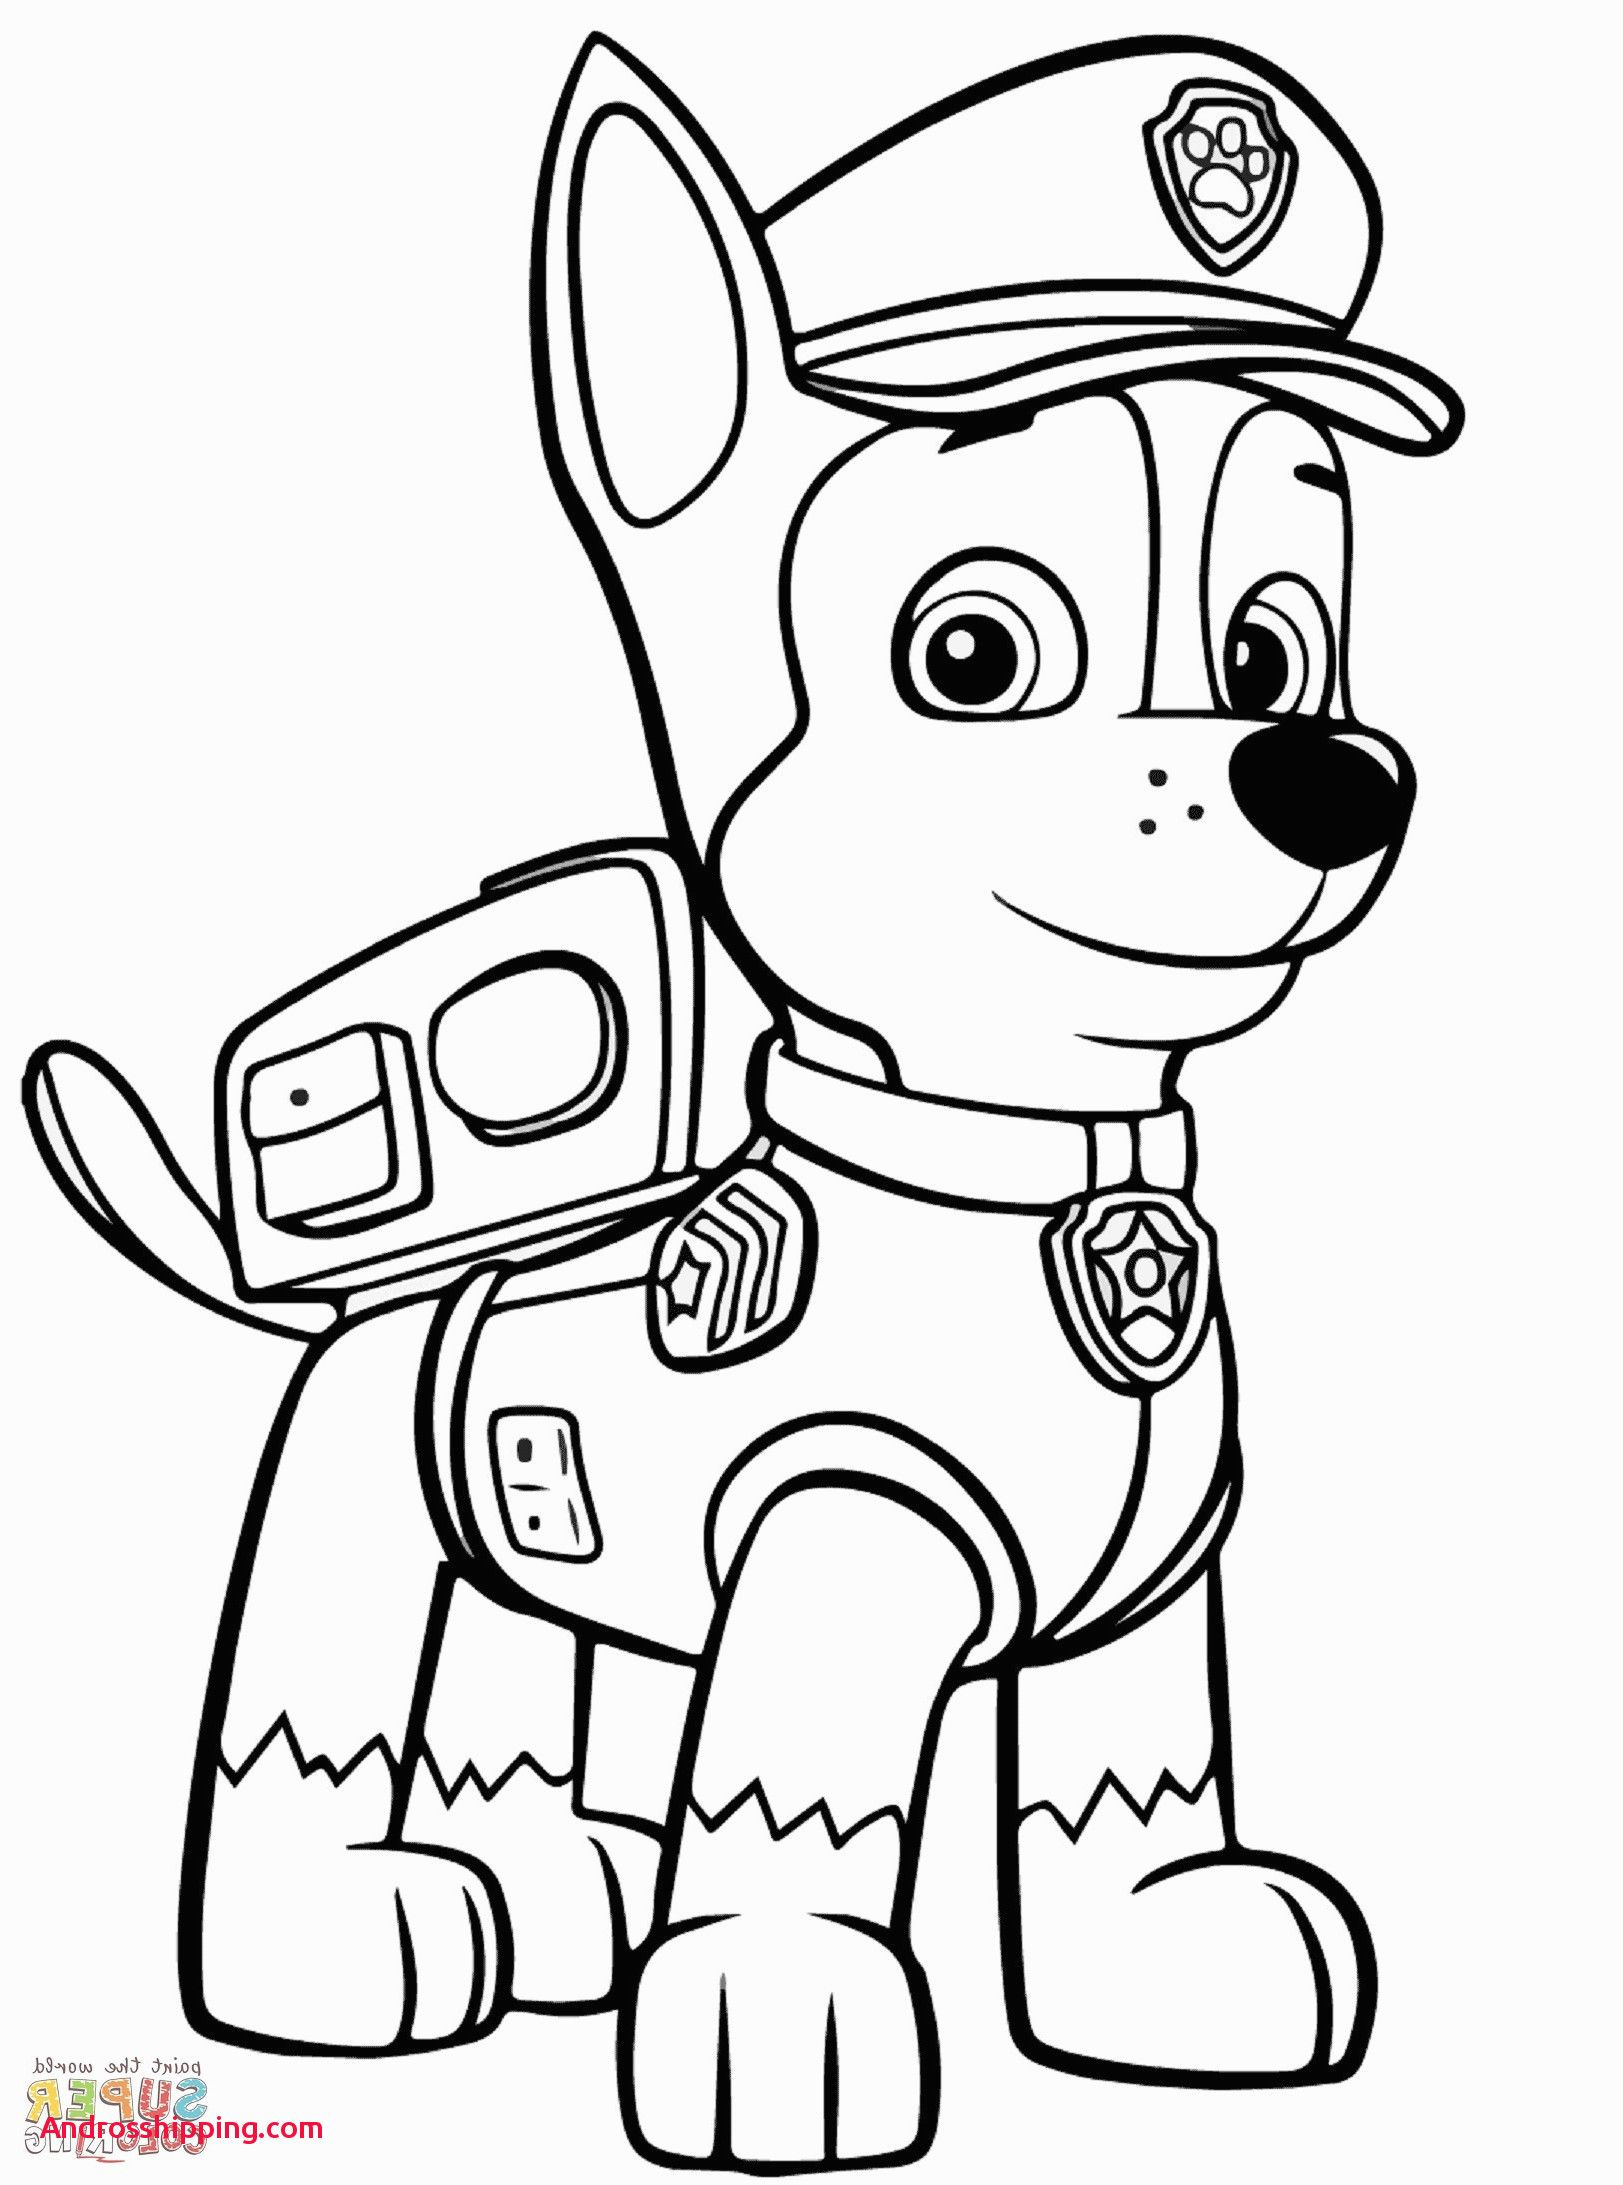 Rocky Paw Patrol Coloring Page Youngandtae Com Desenhos Para Colorir Carros Patrulha Canina Para Colorir Desenhos Para Colorir Peppa